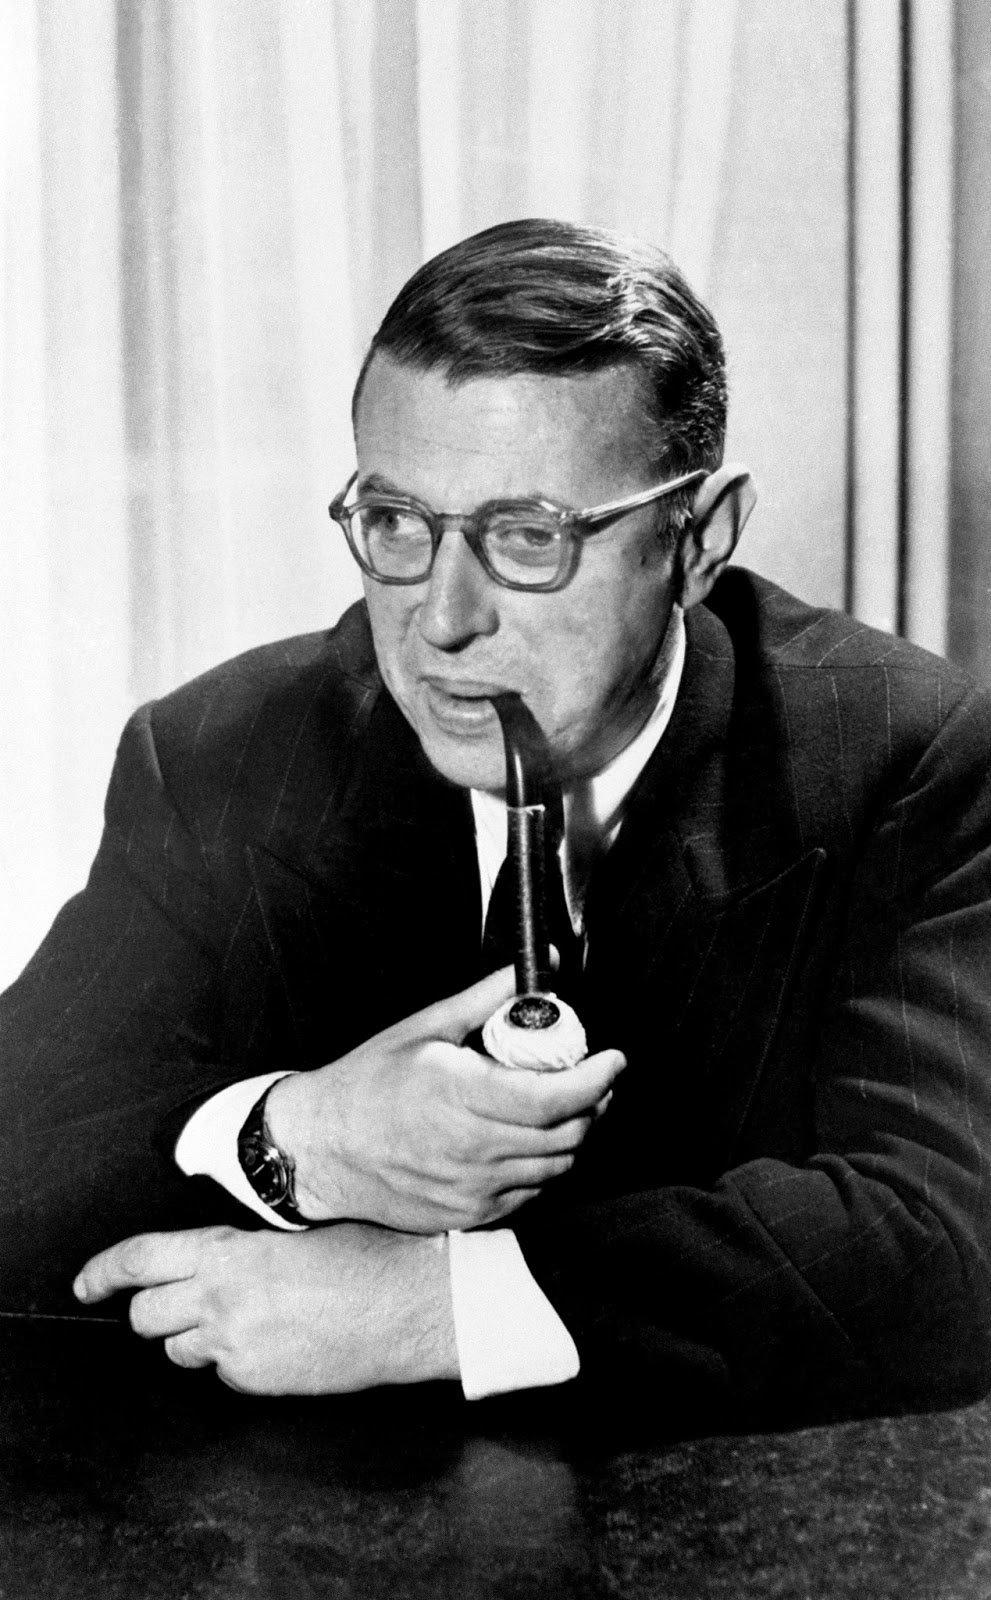 Chi era Jean-Paul Sartre